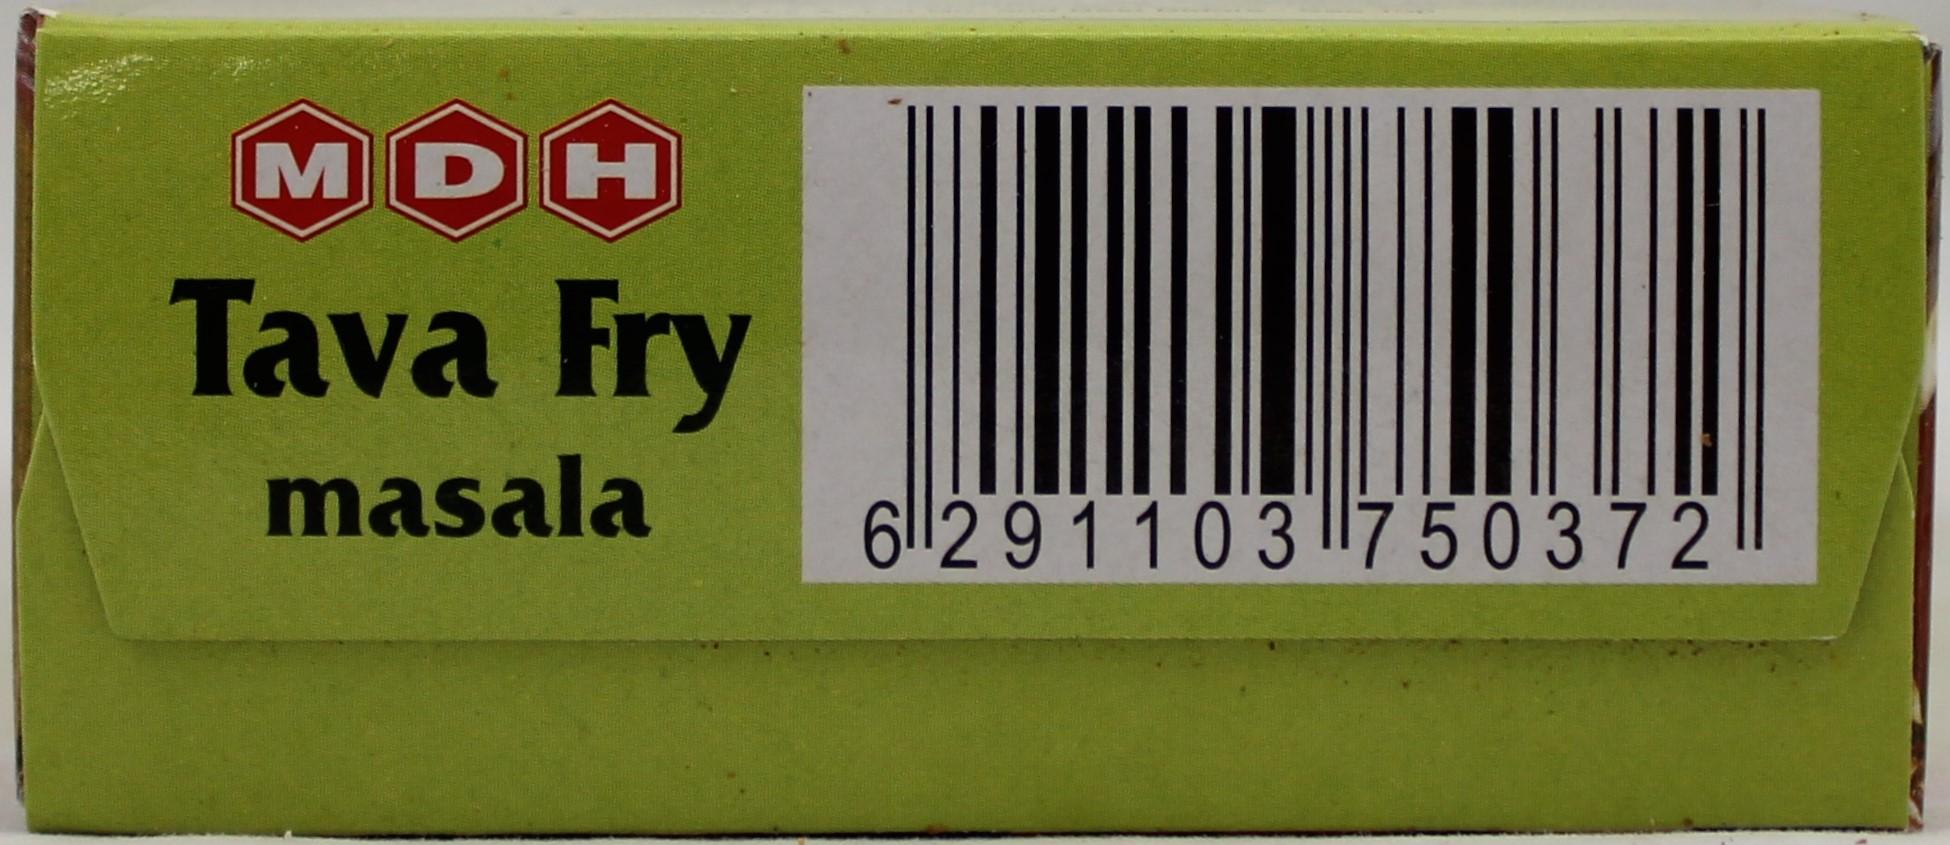 Tava Fry Masala 3.5oz